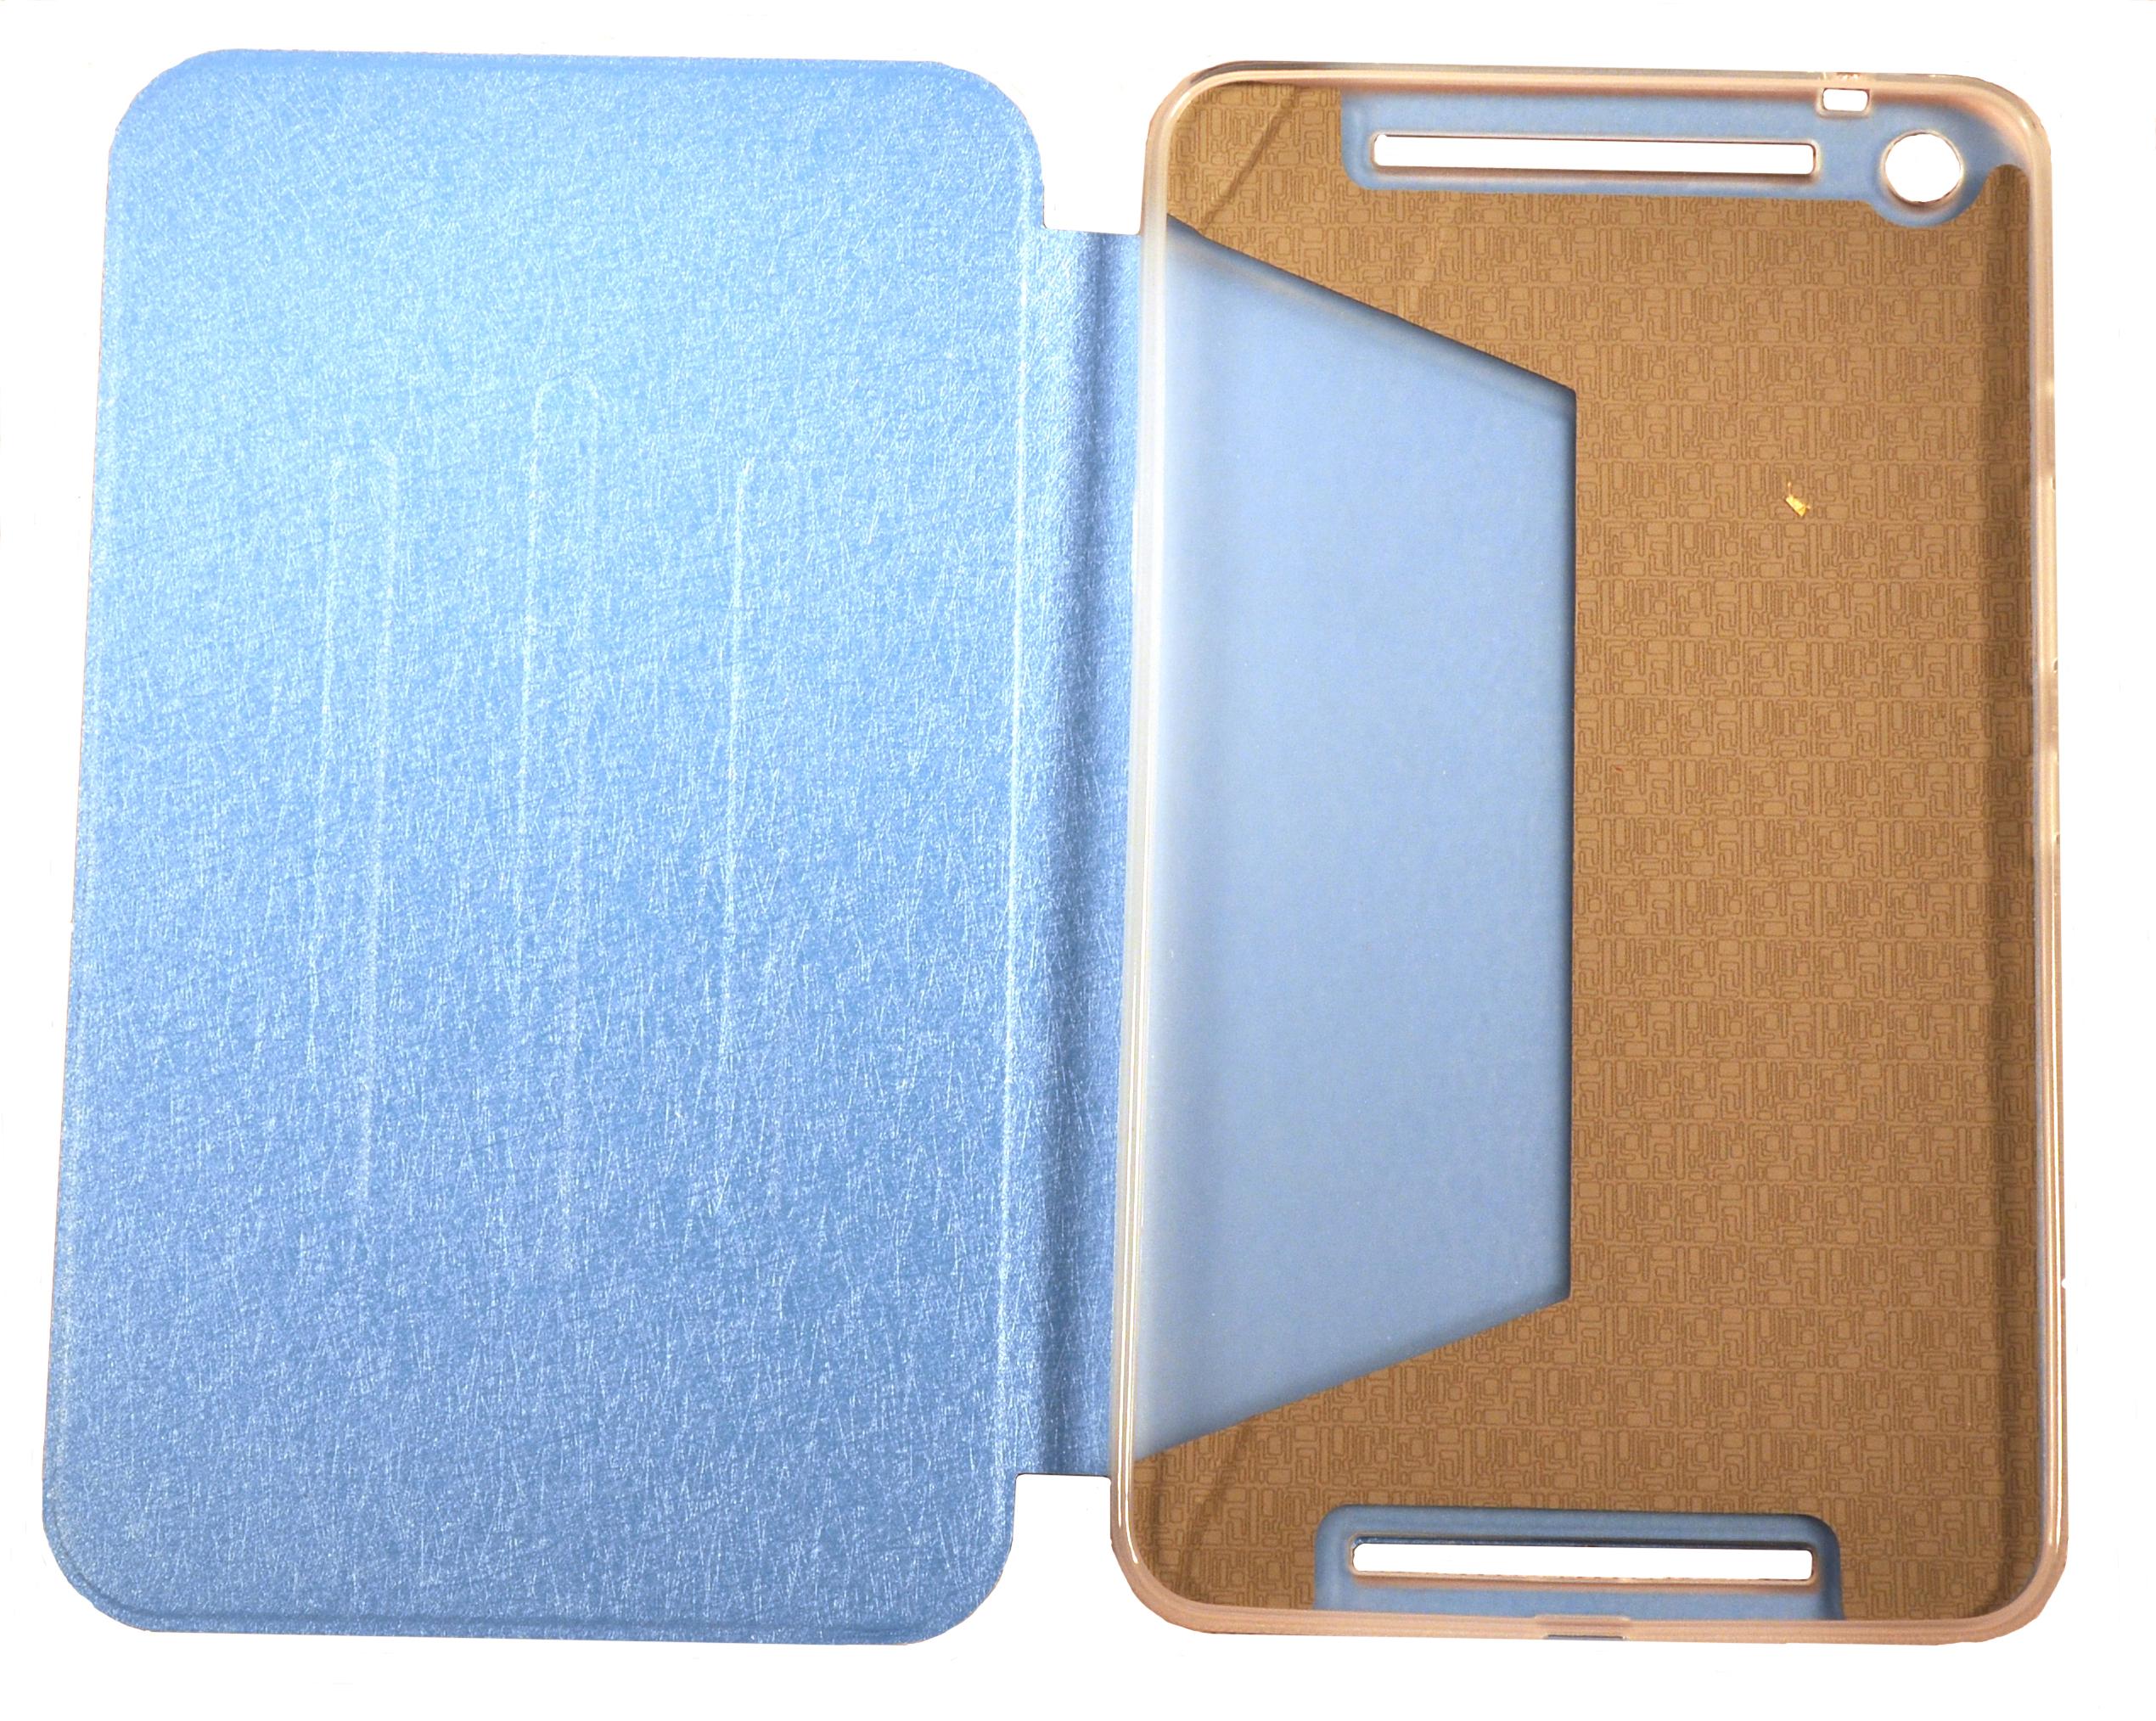 noname ����� ������-����� Book Cover ��� ASUS MeMO Pad 8 ME581CL � ����������� ���������� ��� �������� (�������)